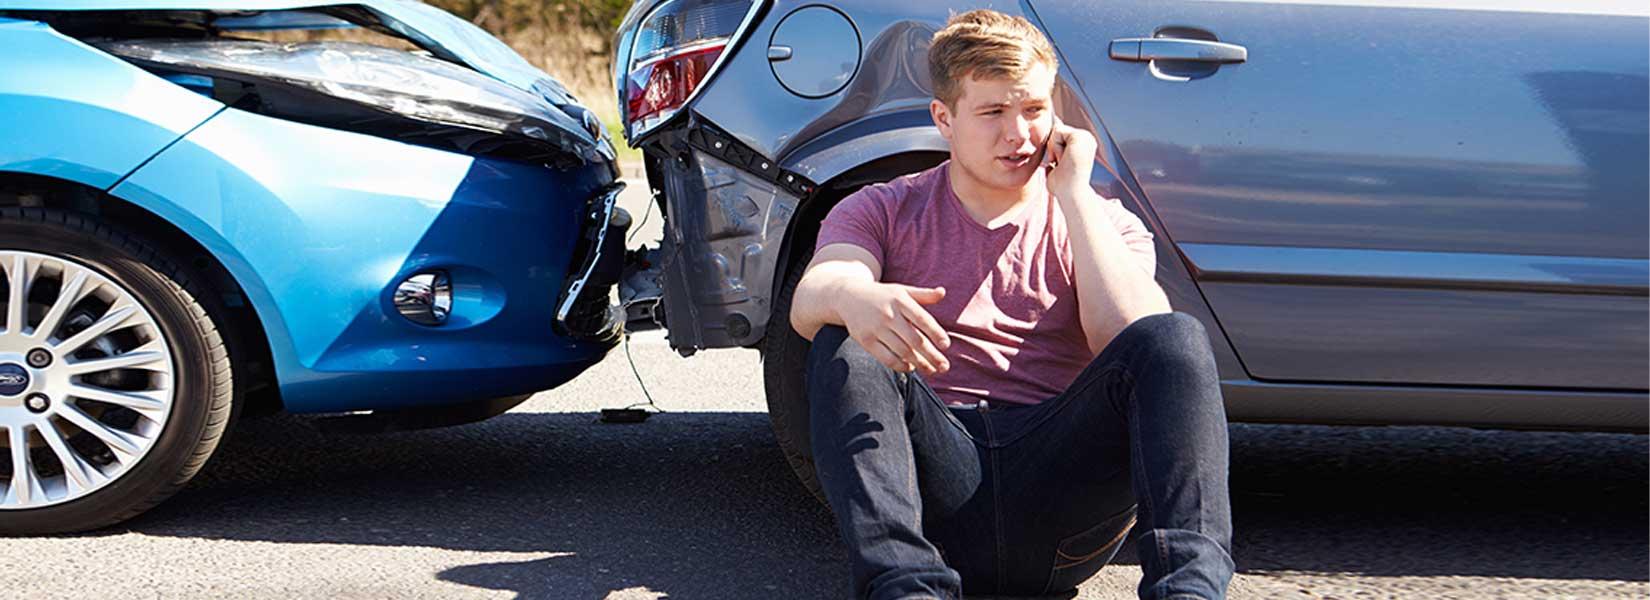 teen car-crashes